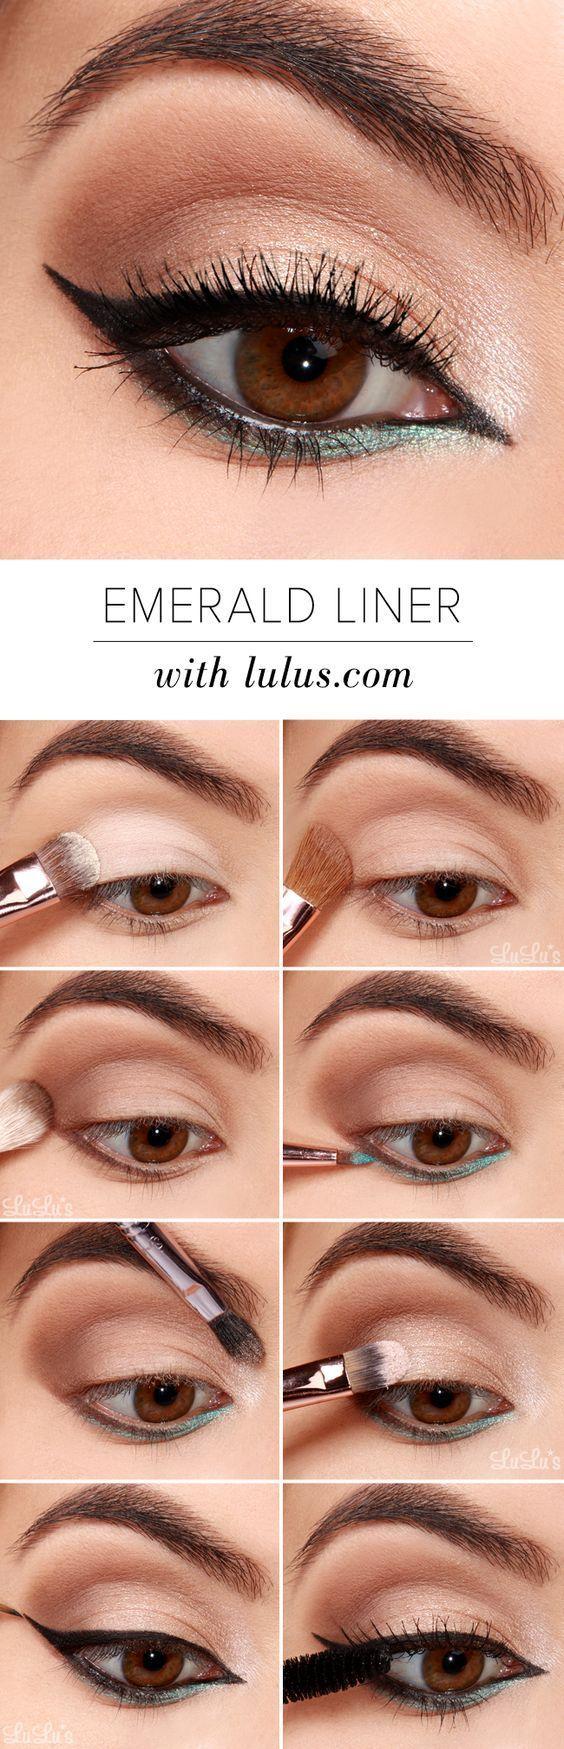 10 Easy Step-By-Step Eyeliner Tutorials For Beginners: #7. Black and Emerald Eye...